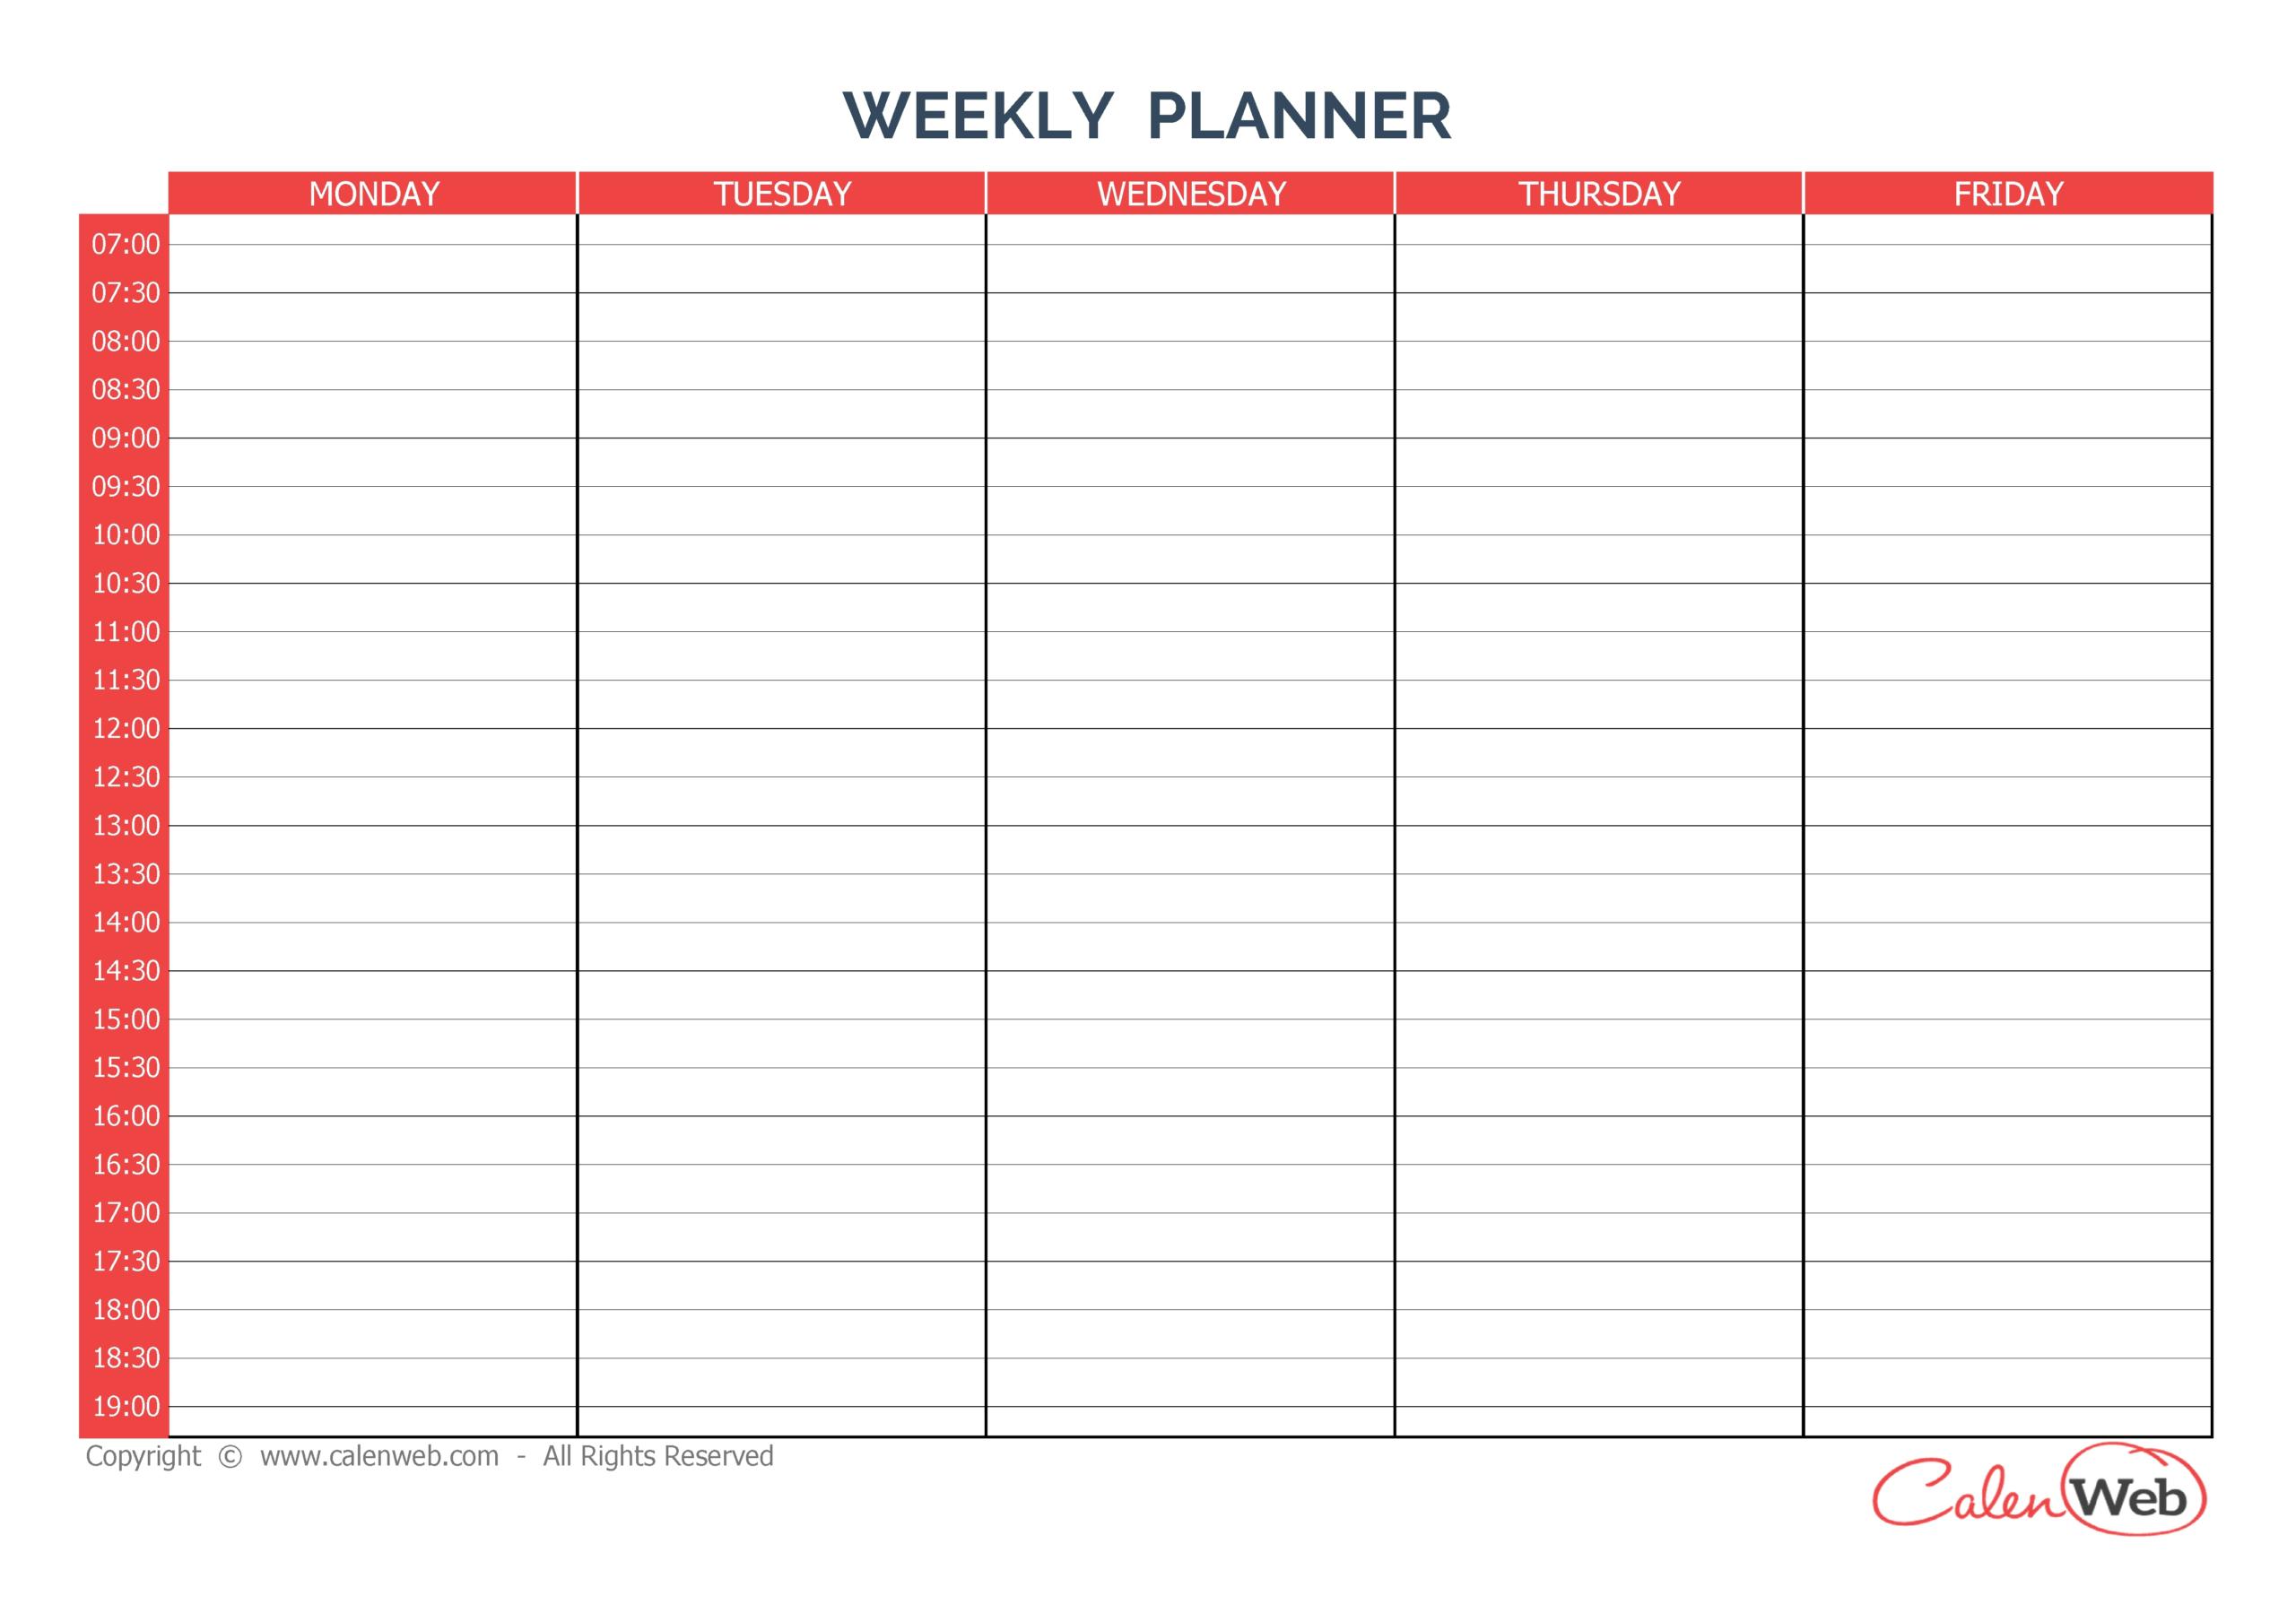 Weekly Calendar | Free Download On Clipartmag throughout Blank Calendar 5 Day Week